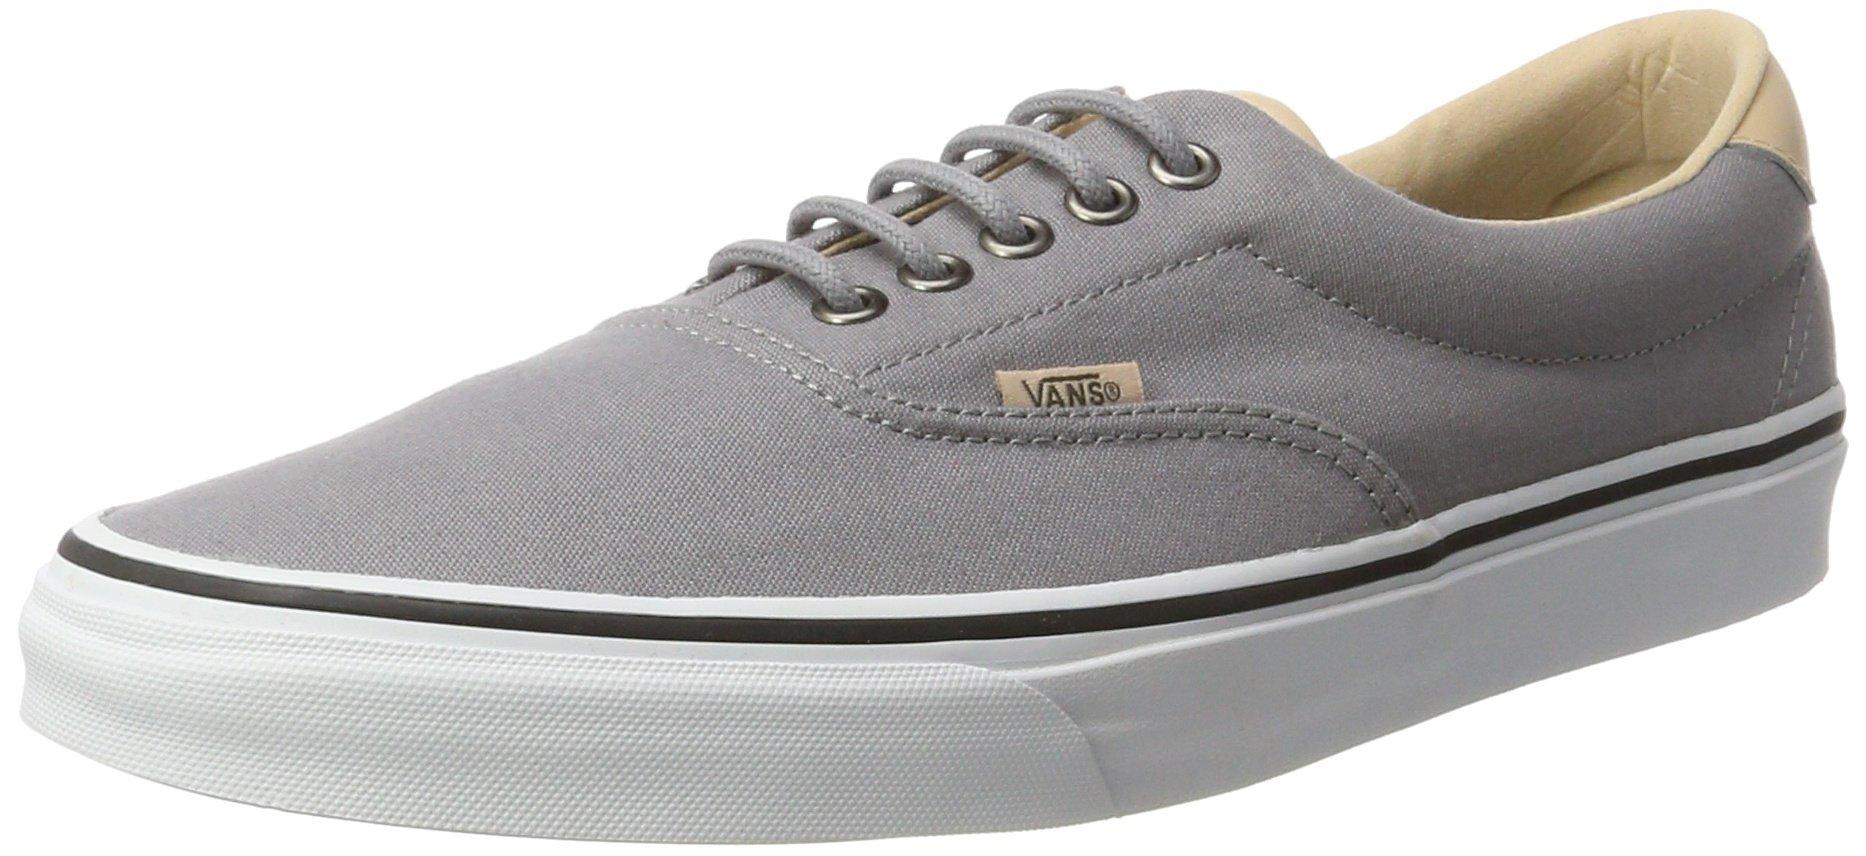 1dcd161637bc8c Galleon - Vans Men s Era 59 (Veggie Tan) Skateboarding Shoes (9.5 B(M) US  Women   8 D(M) US Men